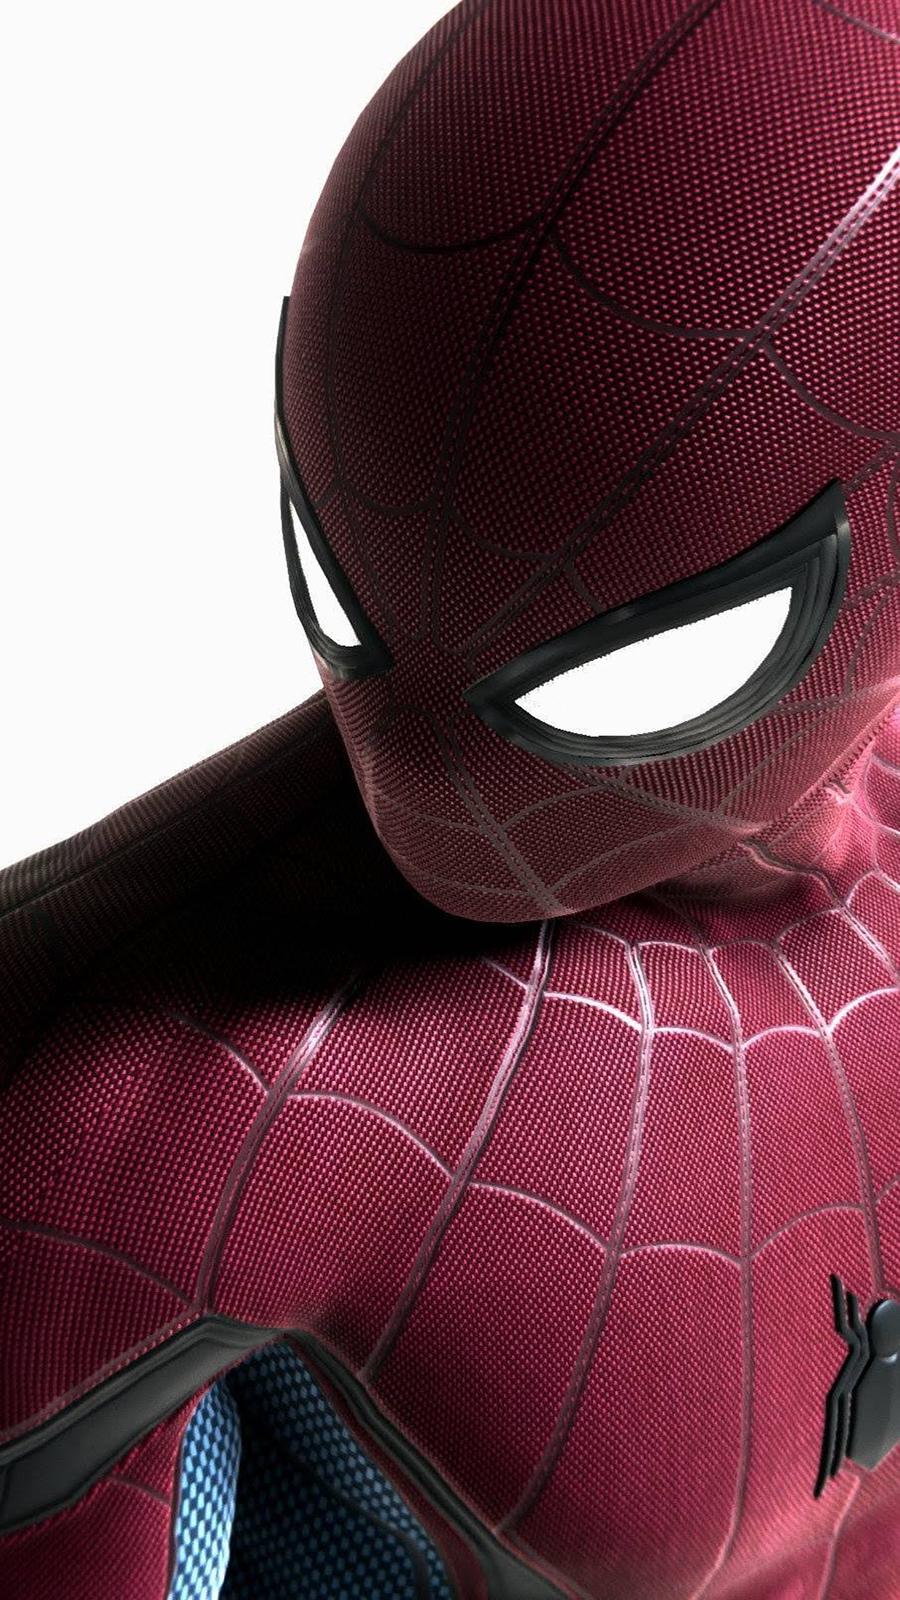 SPIDER MAN HD Wallpapers Free Download for Phone & Desktop (2)